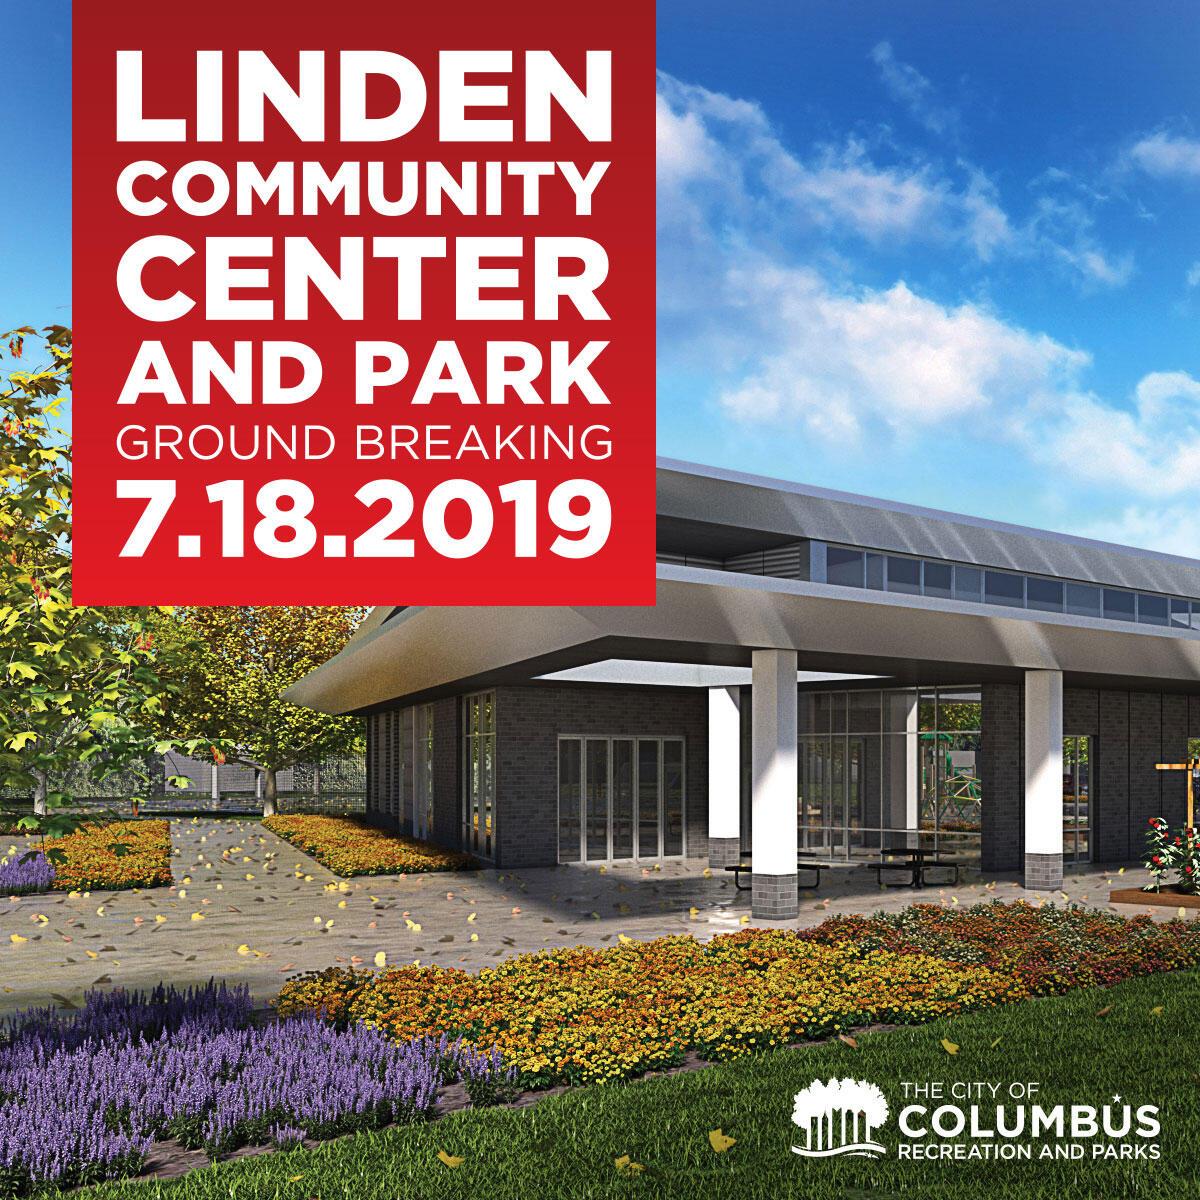 Linden Center Post